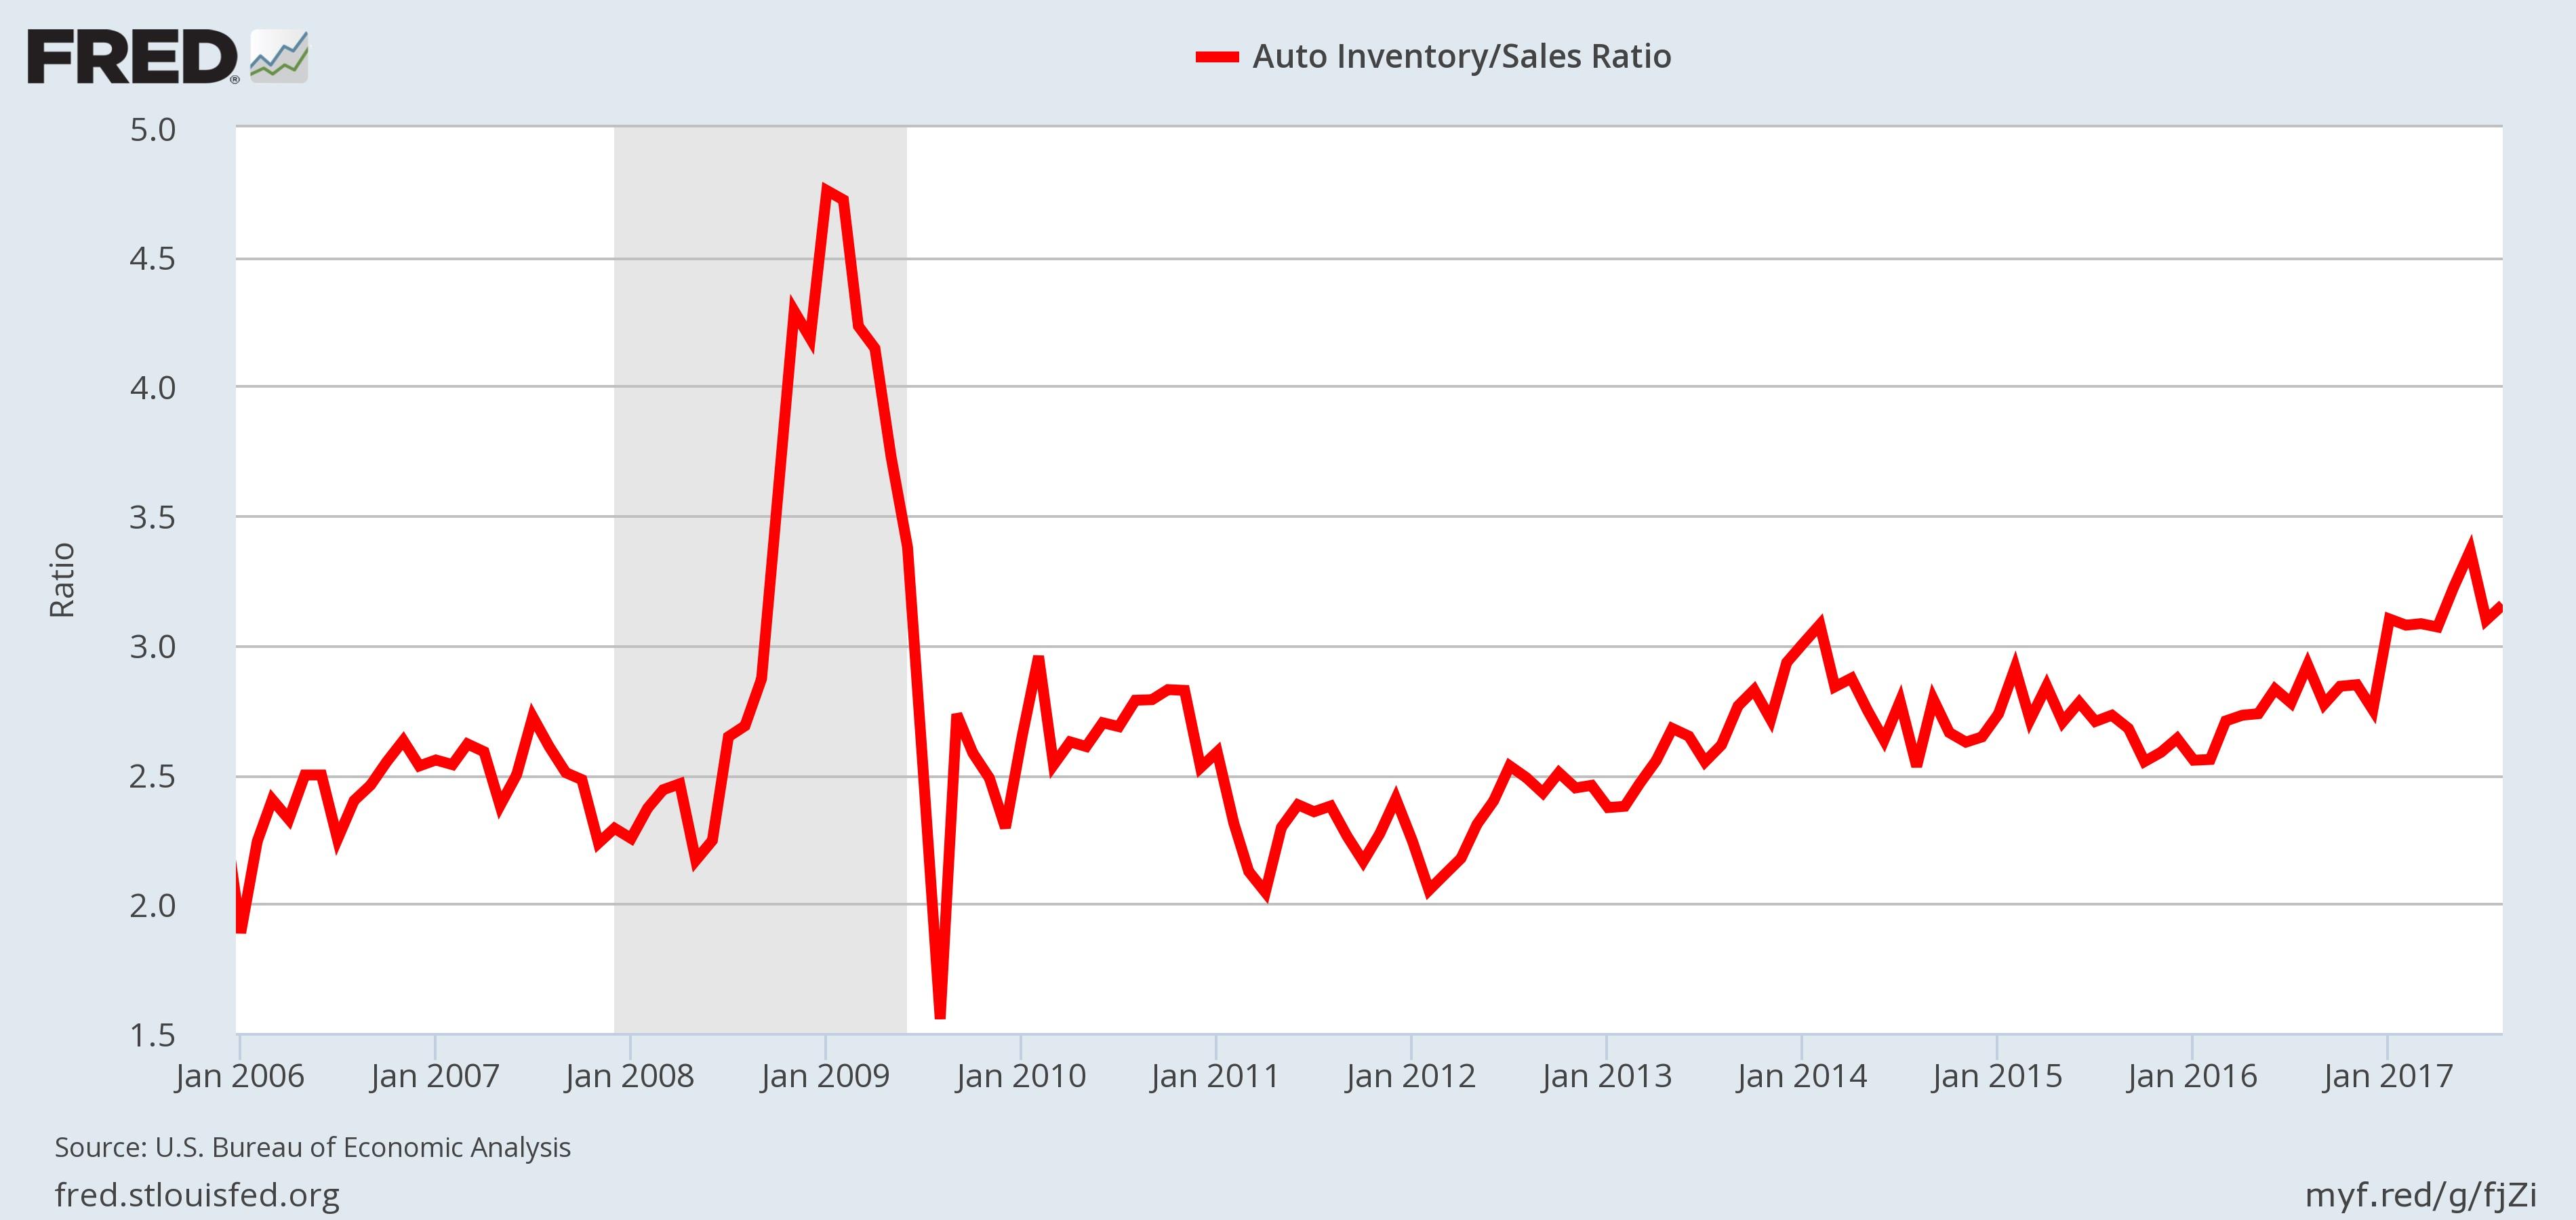 Recession Indicator- Auto Inventory